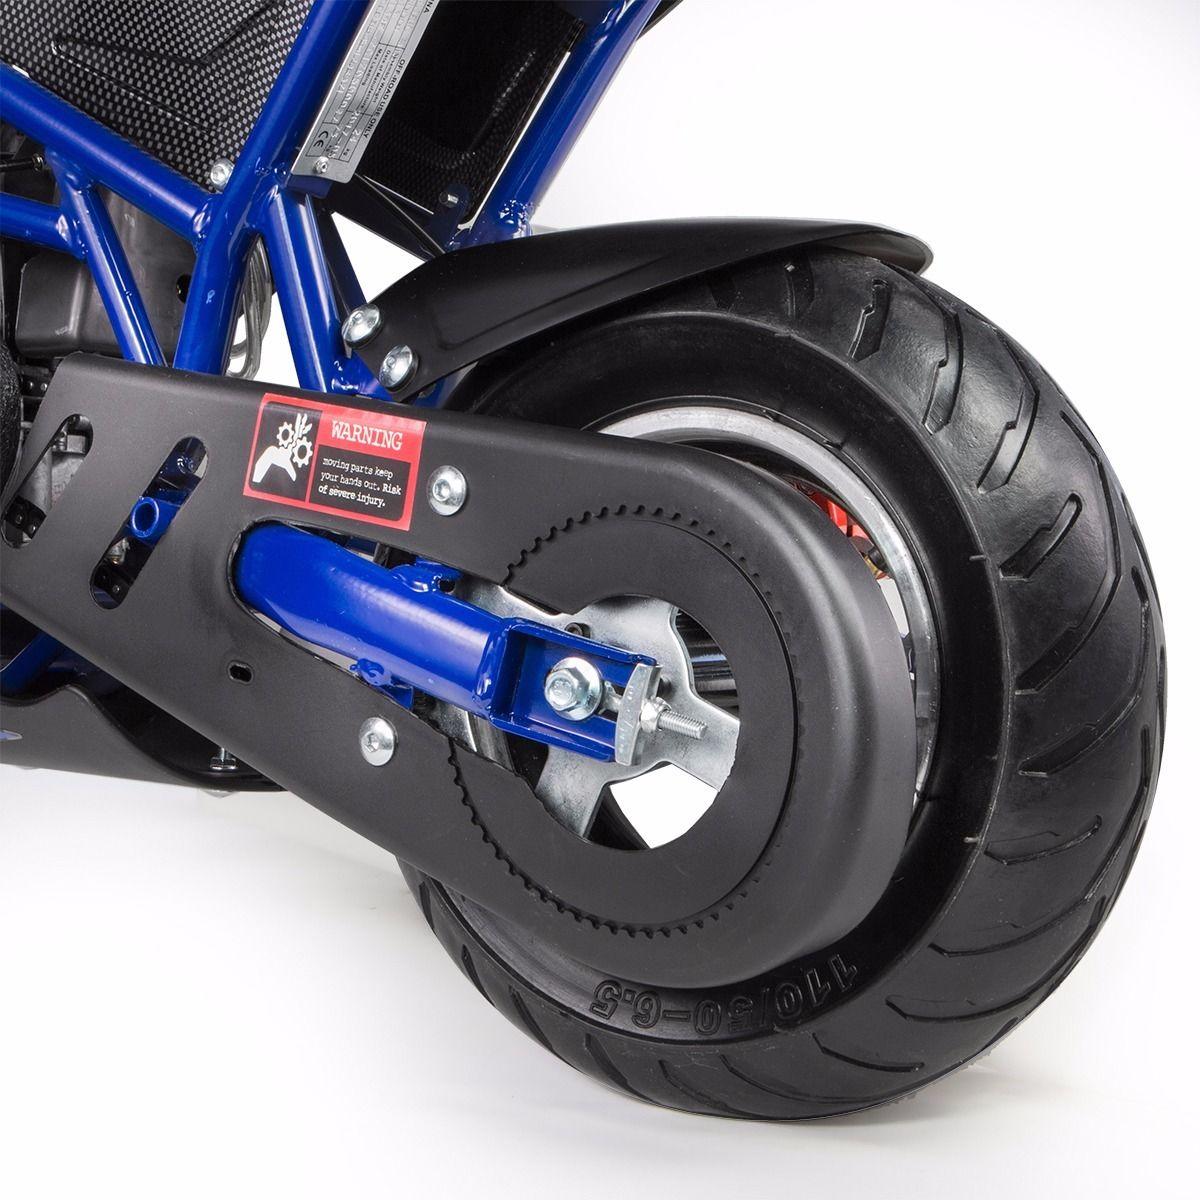 XtremepowerUS-Gas-Pocket-Bike-Motor-Bike-Scooter-40cc-Epa-Engine-Motorcycle thumbnail 10